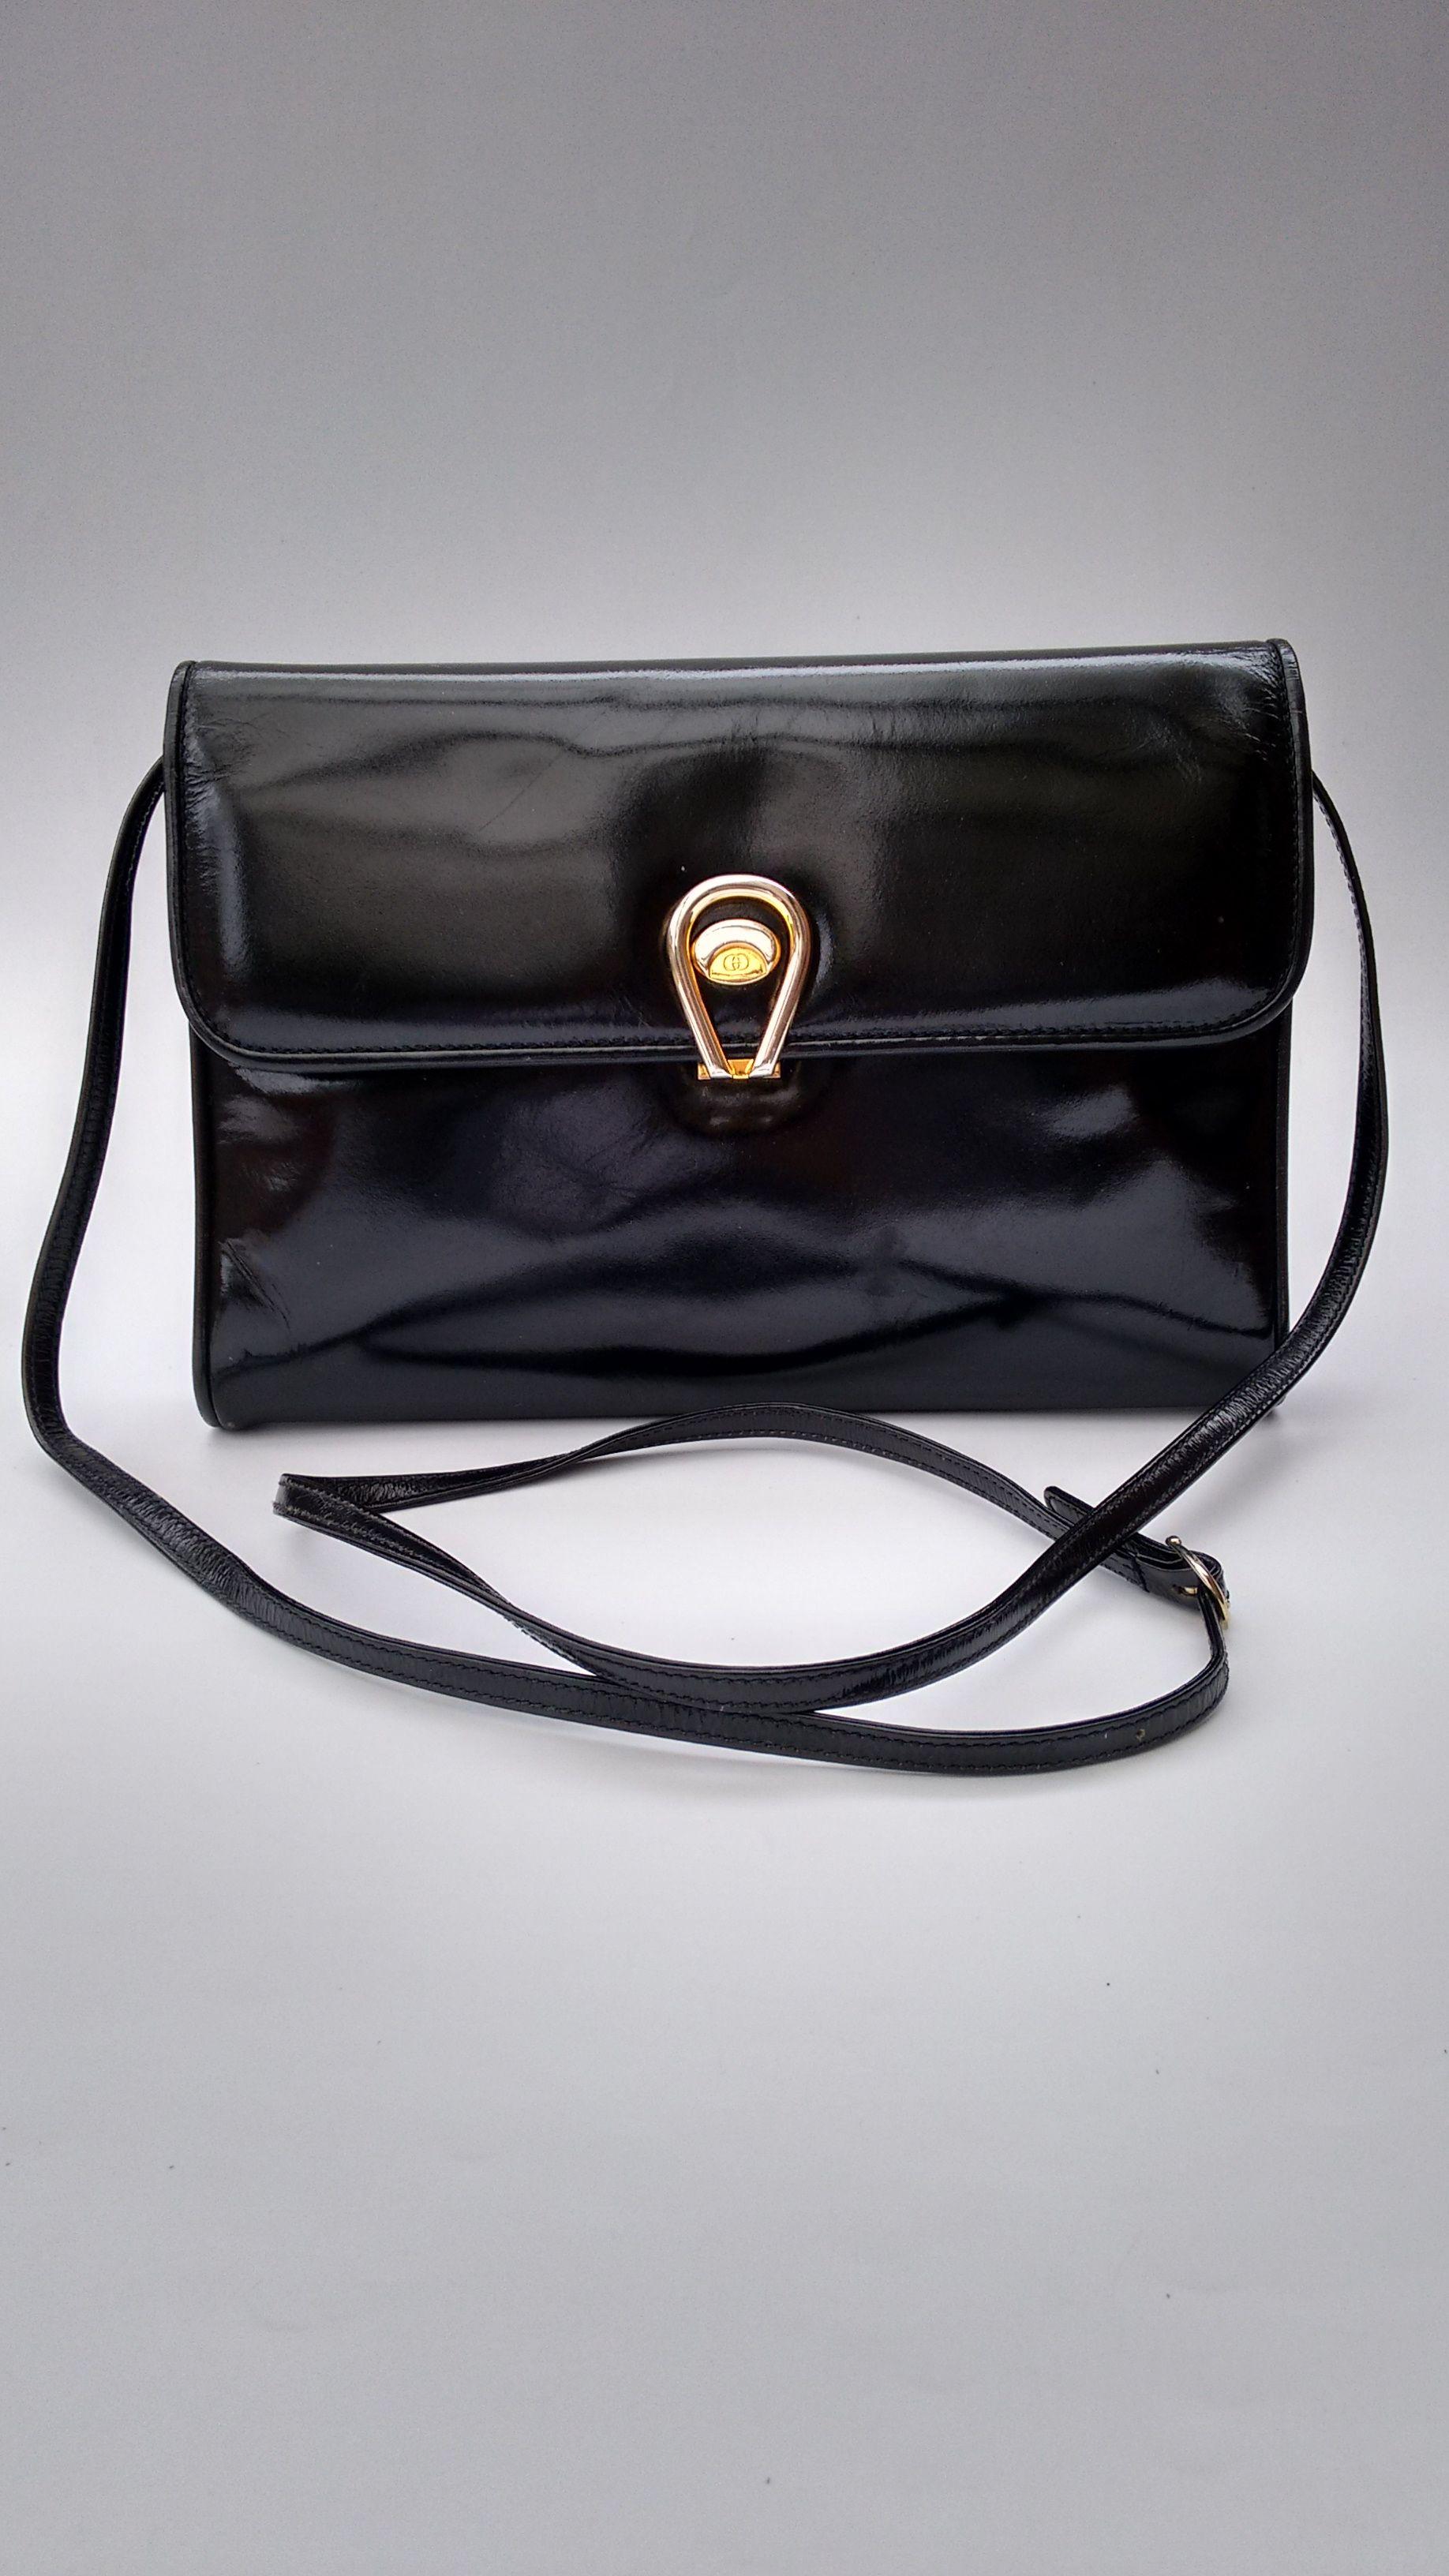 192bd50b2f81c GUCCI Bag. Gucci Vintage Black Patent Leather Shoulder   Crossbody Bag    Clutch. Italian designer purse.